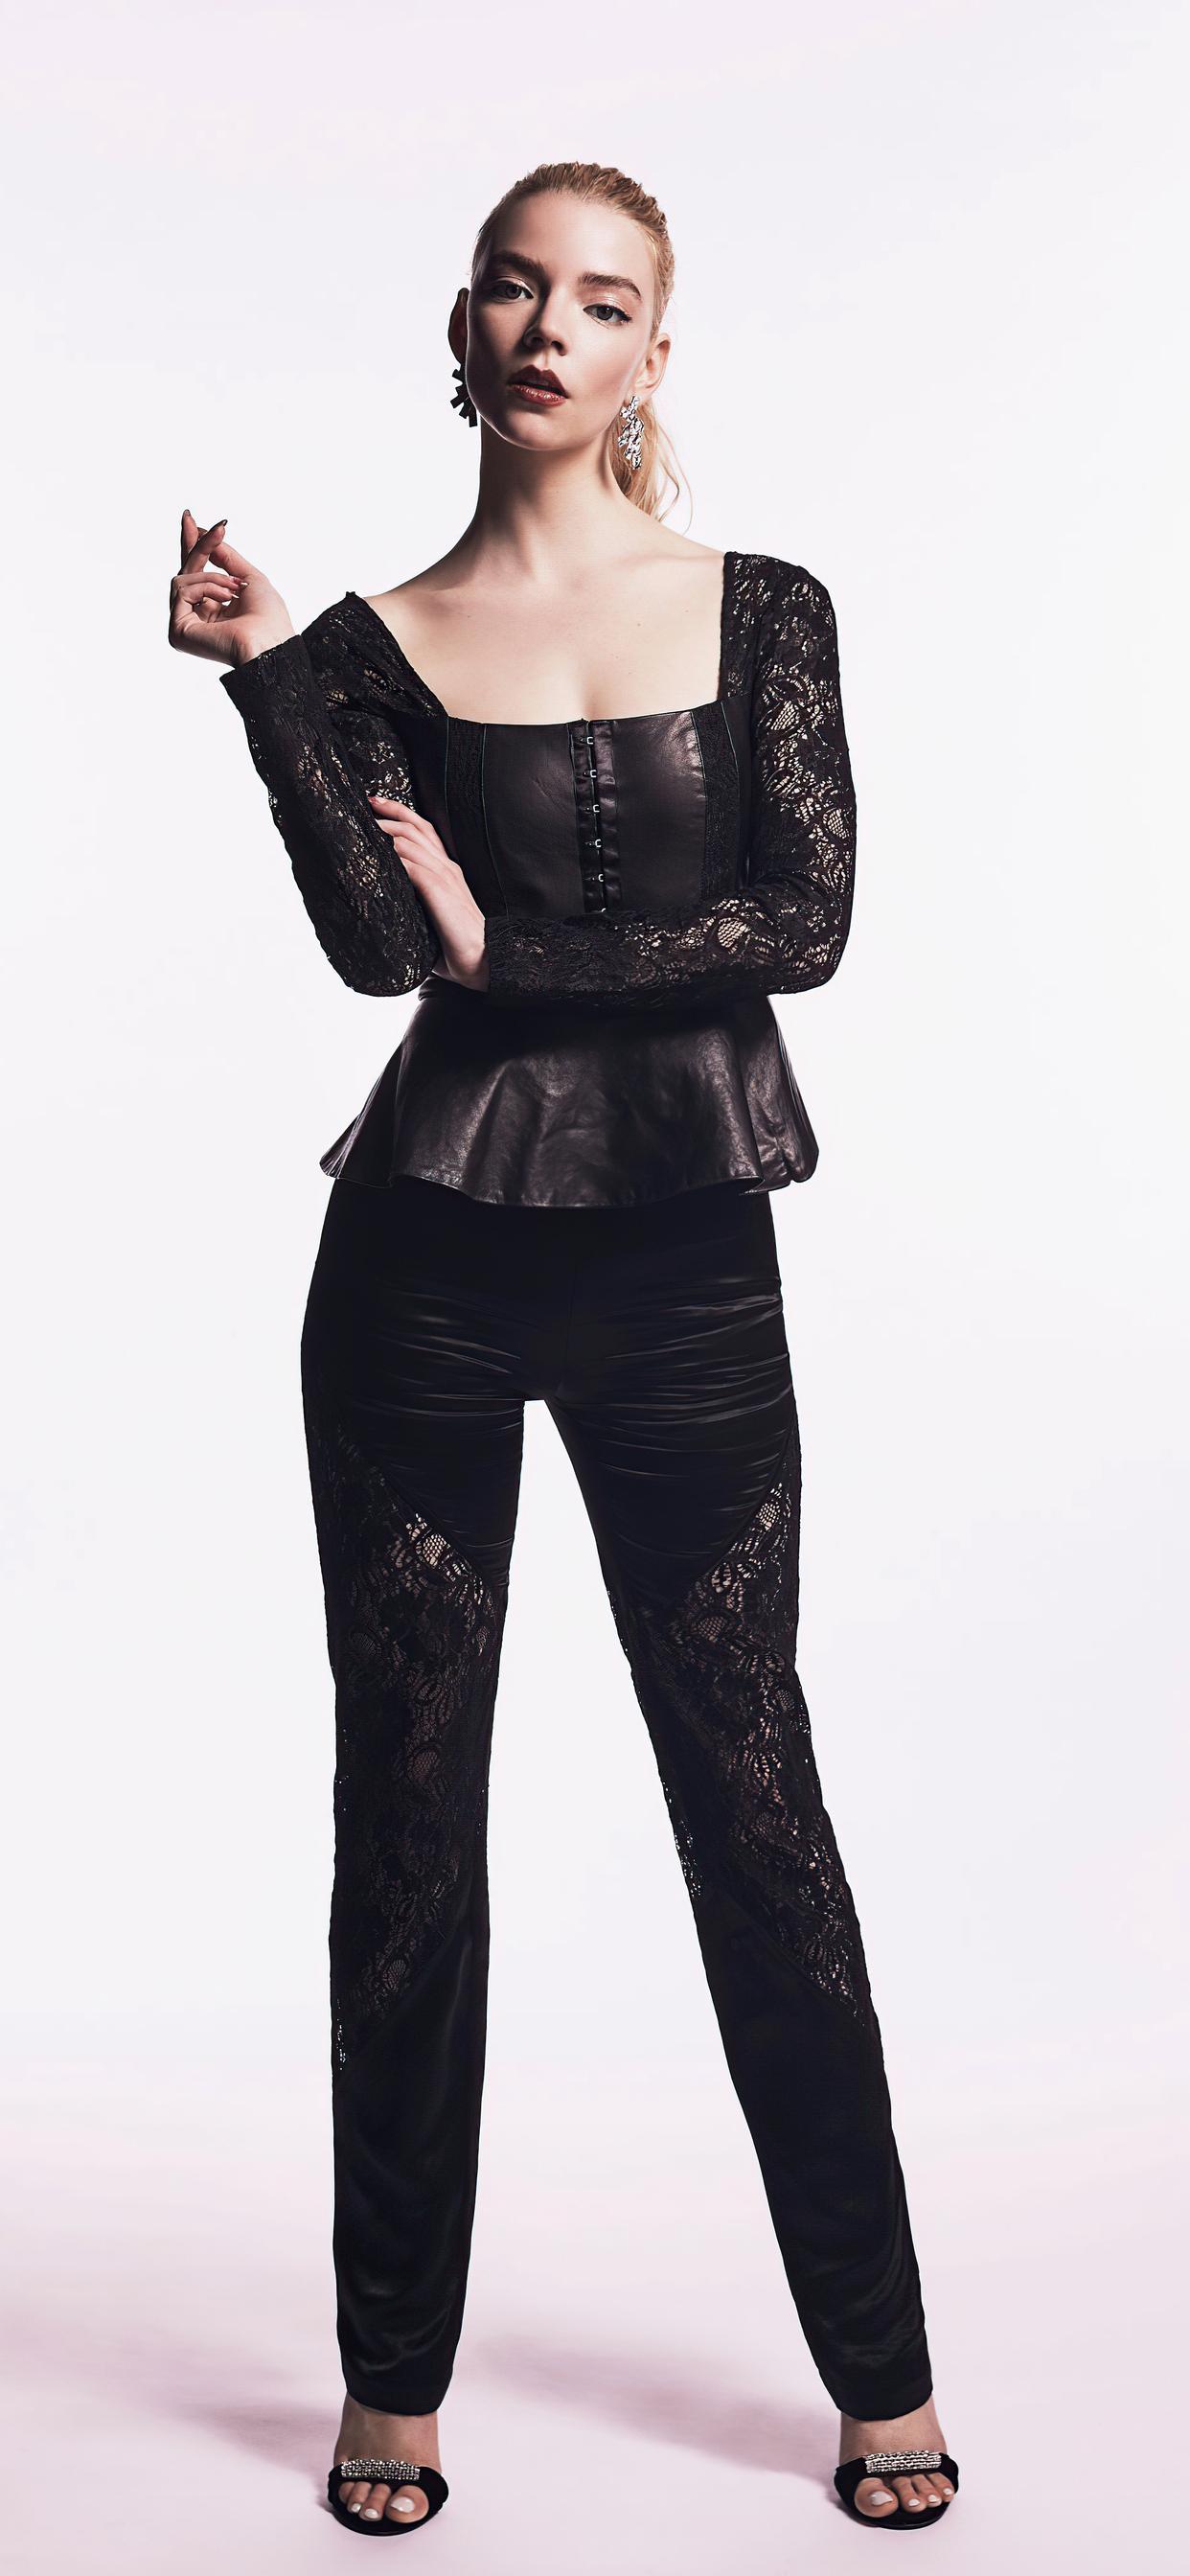 Anya Taylor-Joy HD Last Night in Soho Wallpapers | HD